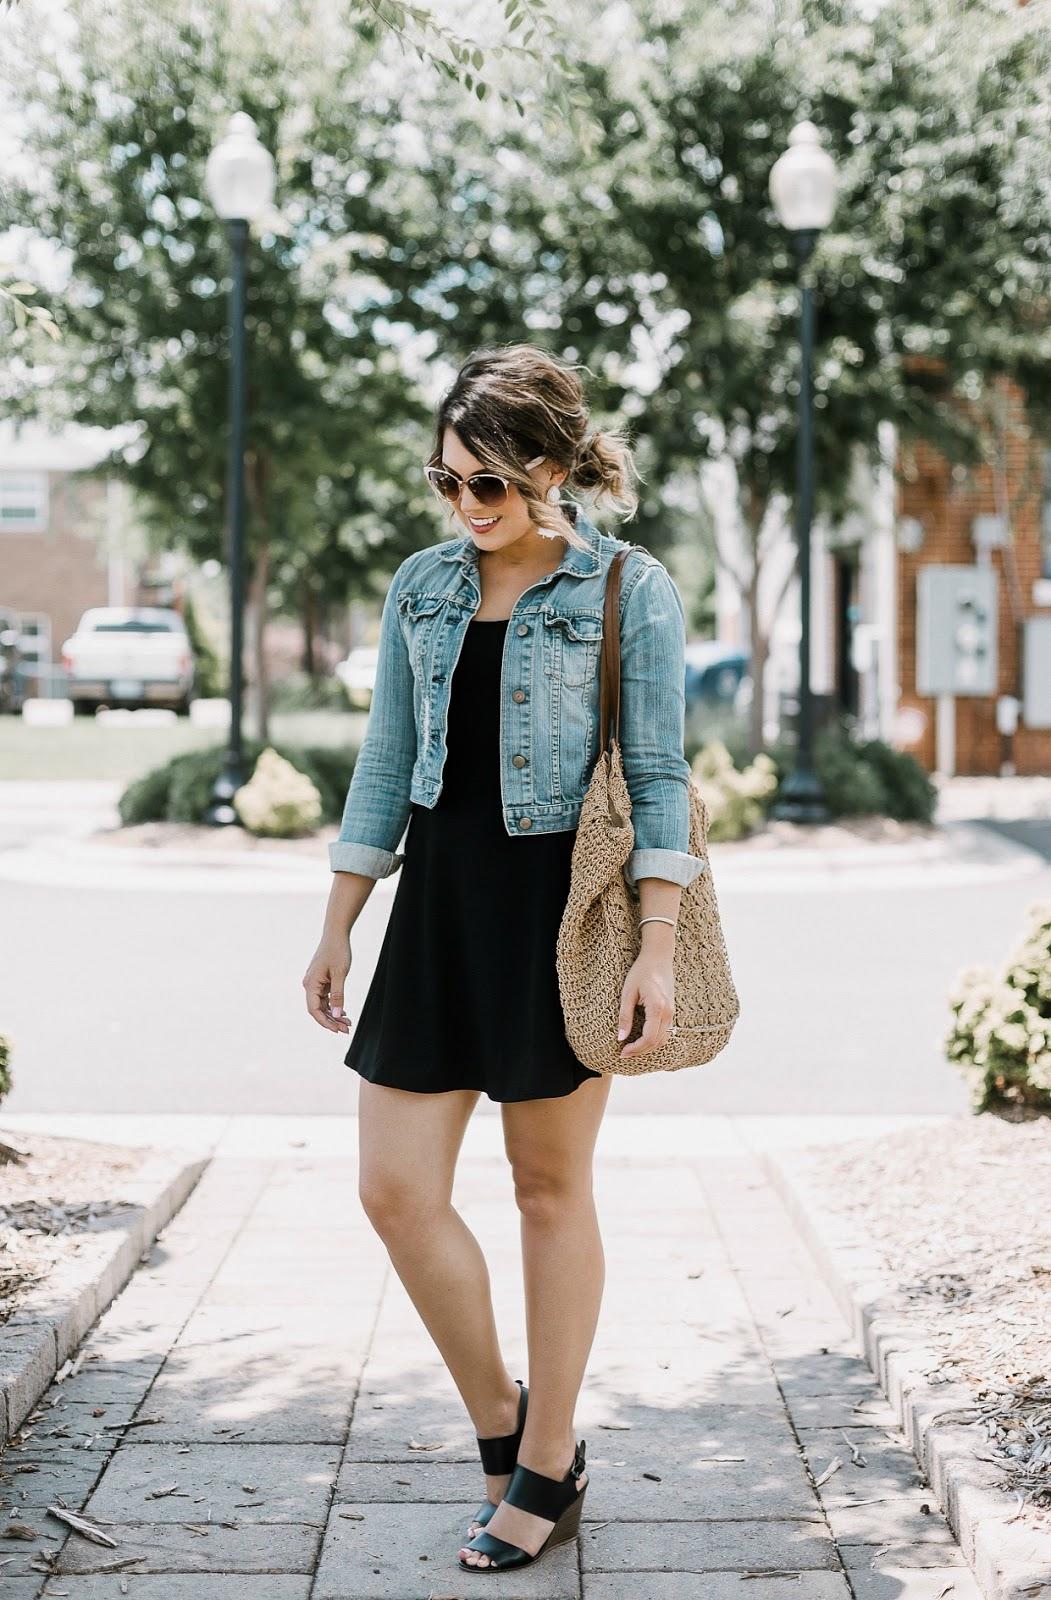 budget fashion, retro sunglasses, hm jersey dress